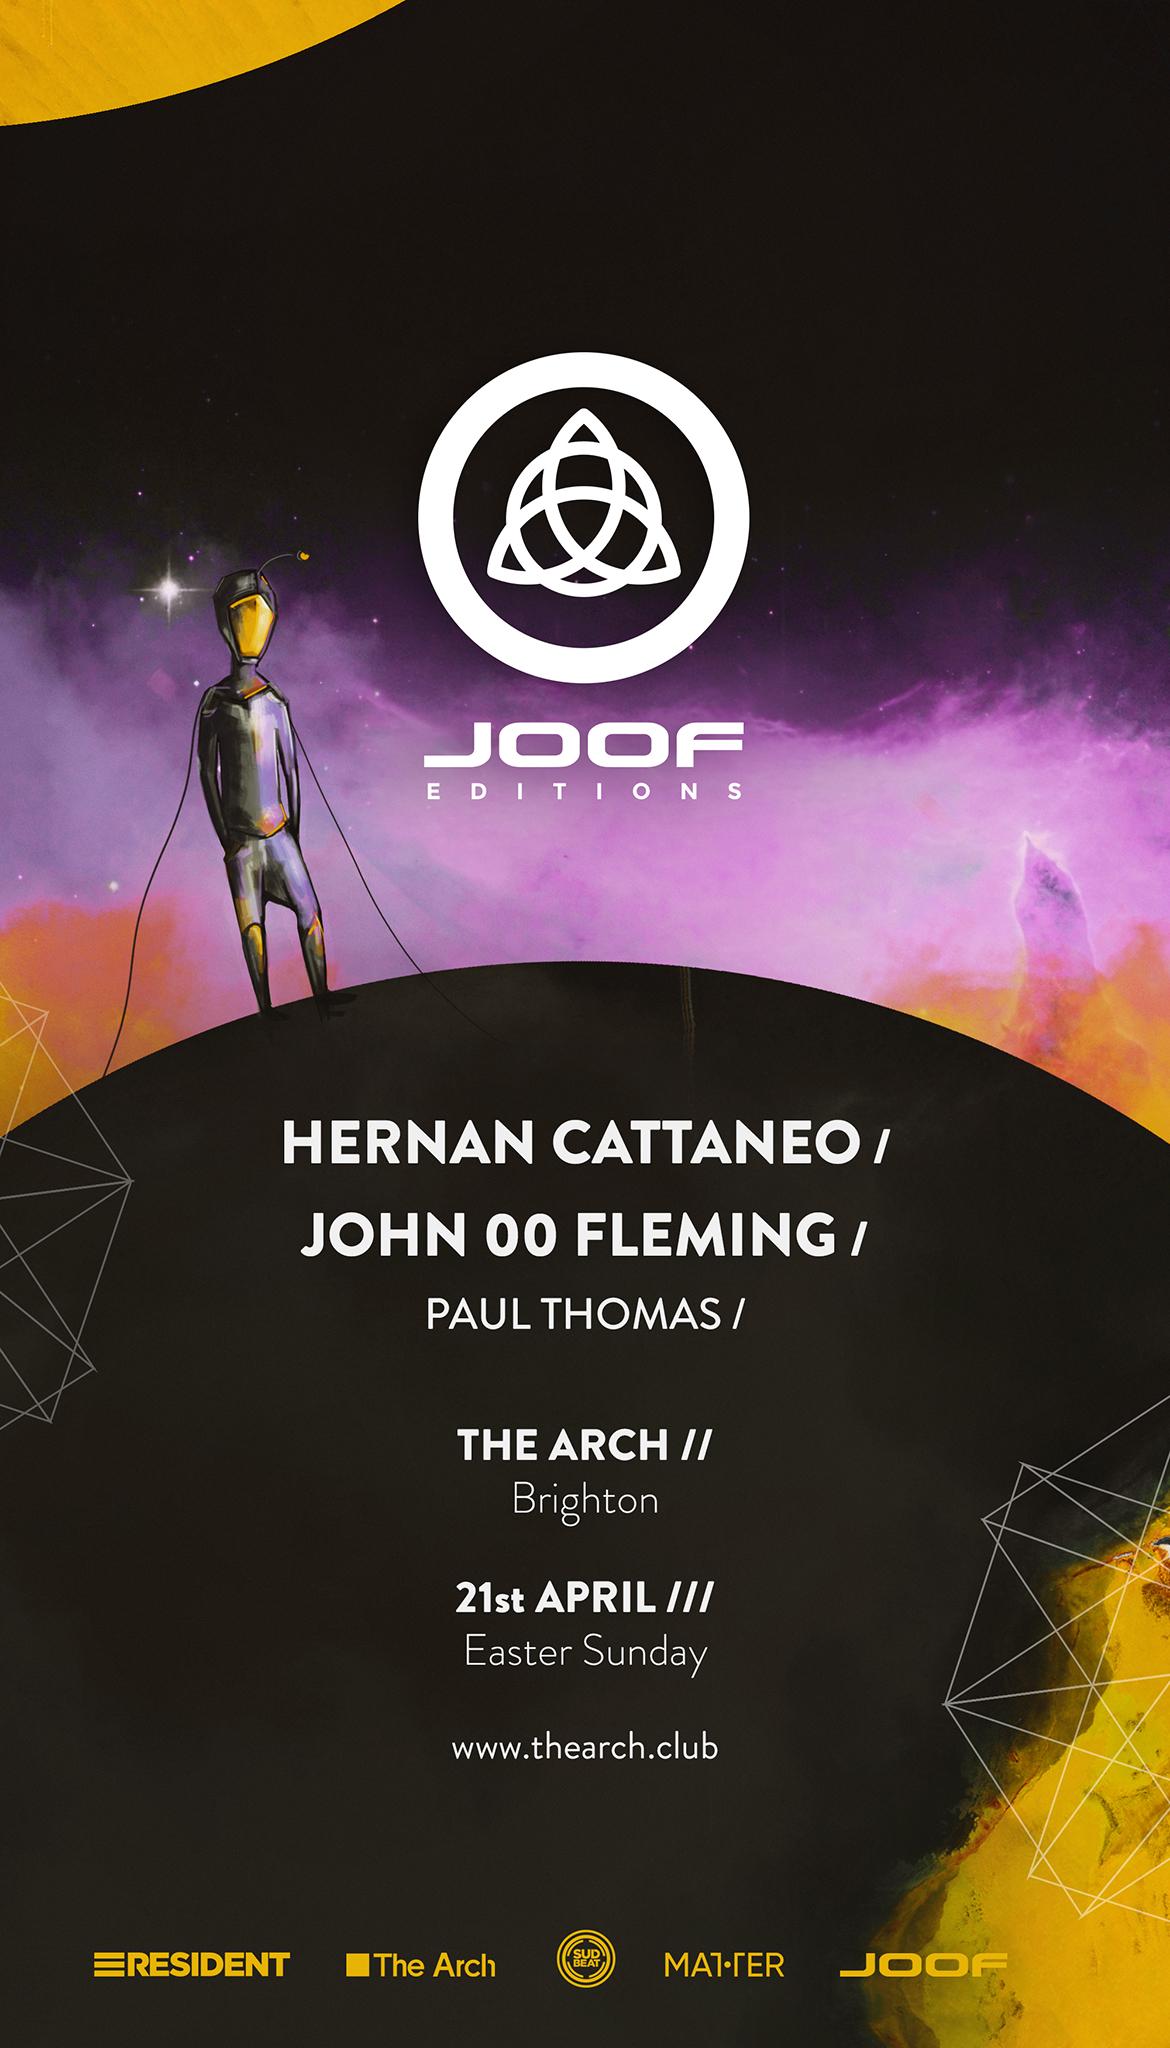 Hernan Cattaneo / JOOF Editions